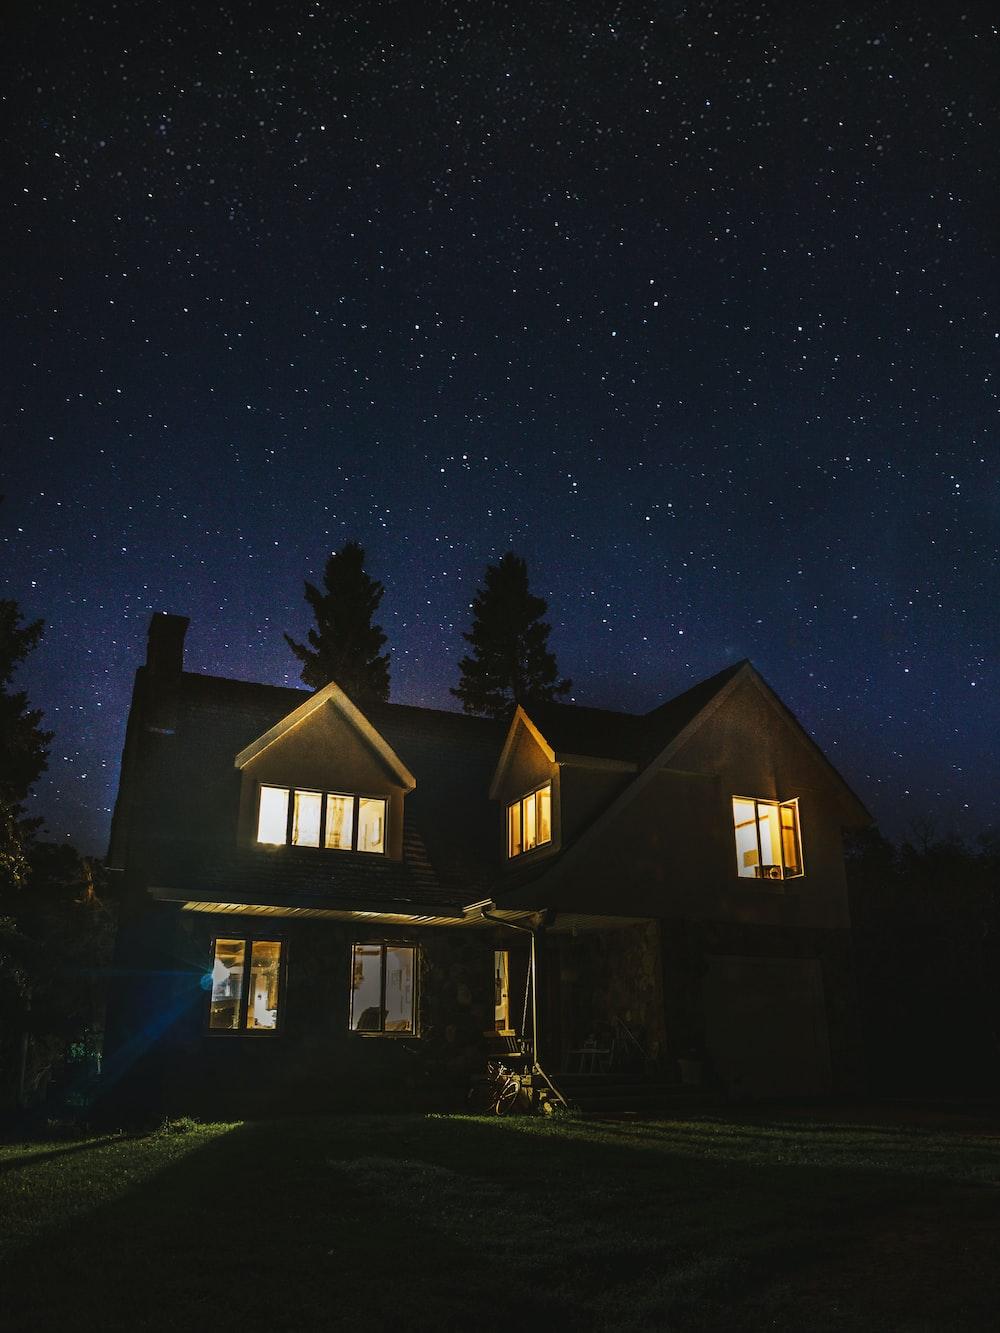 lighted 2-storey house near trees